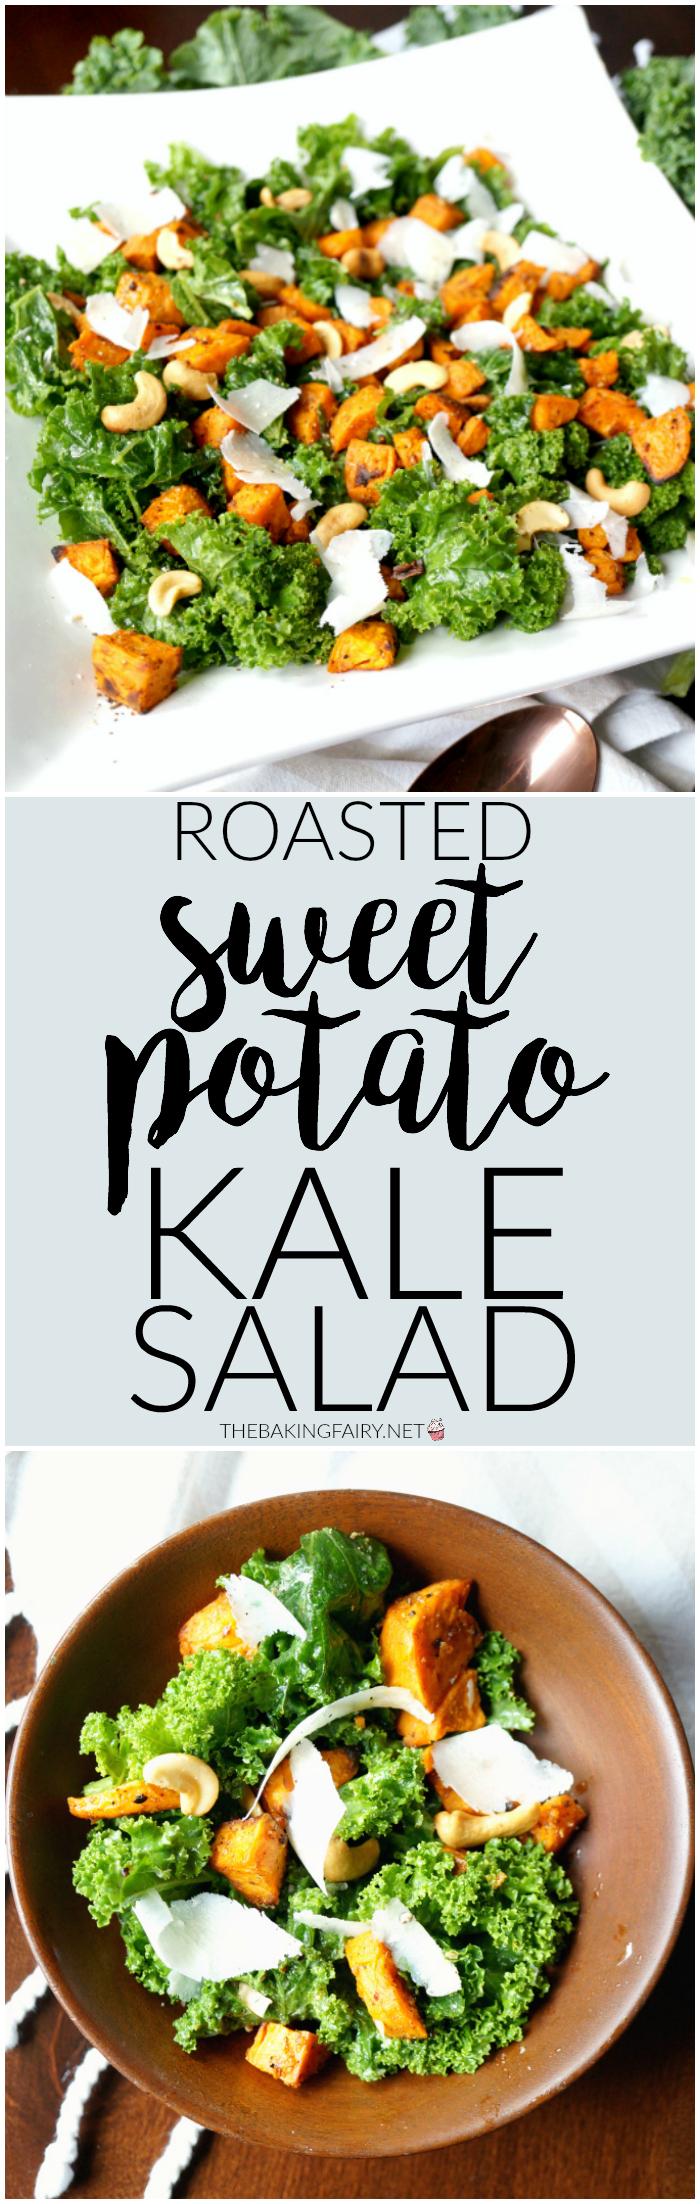 roasted sweet potato kale salad | The Baking Fairy